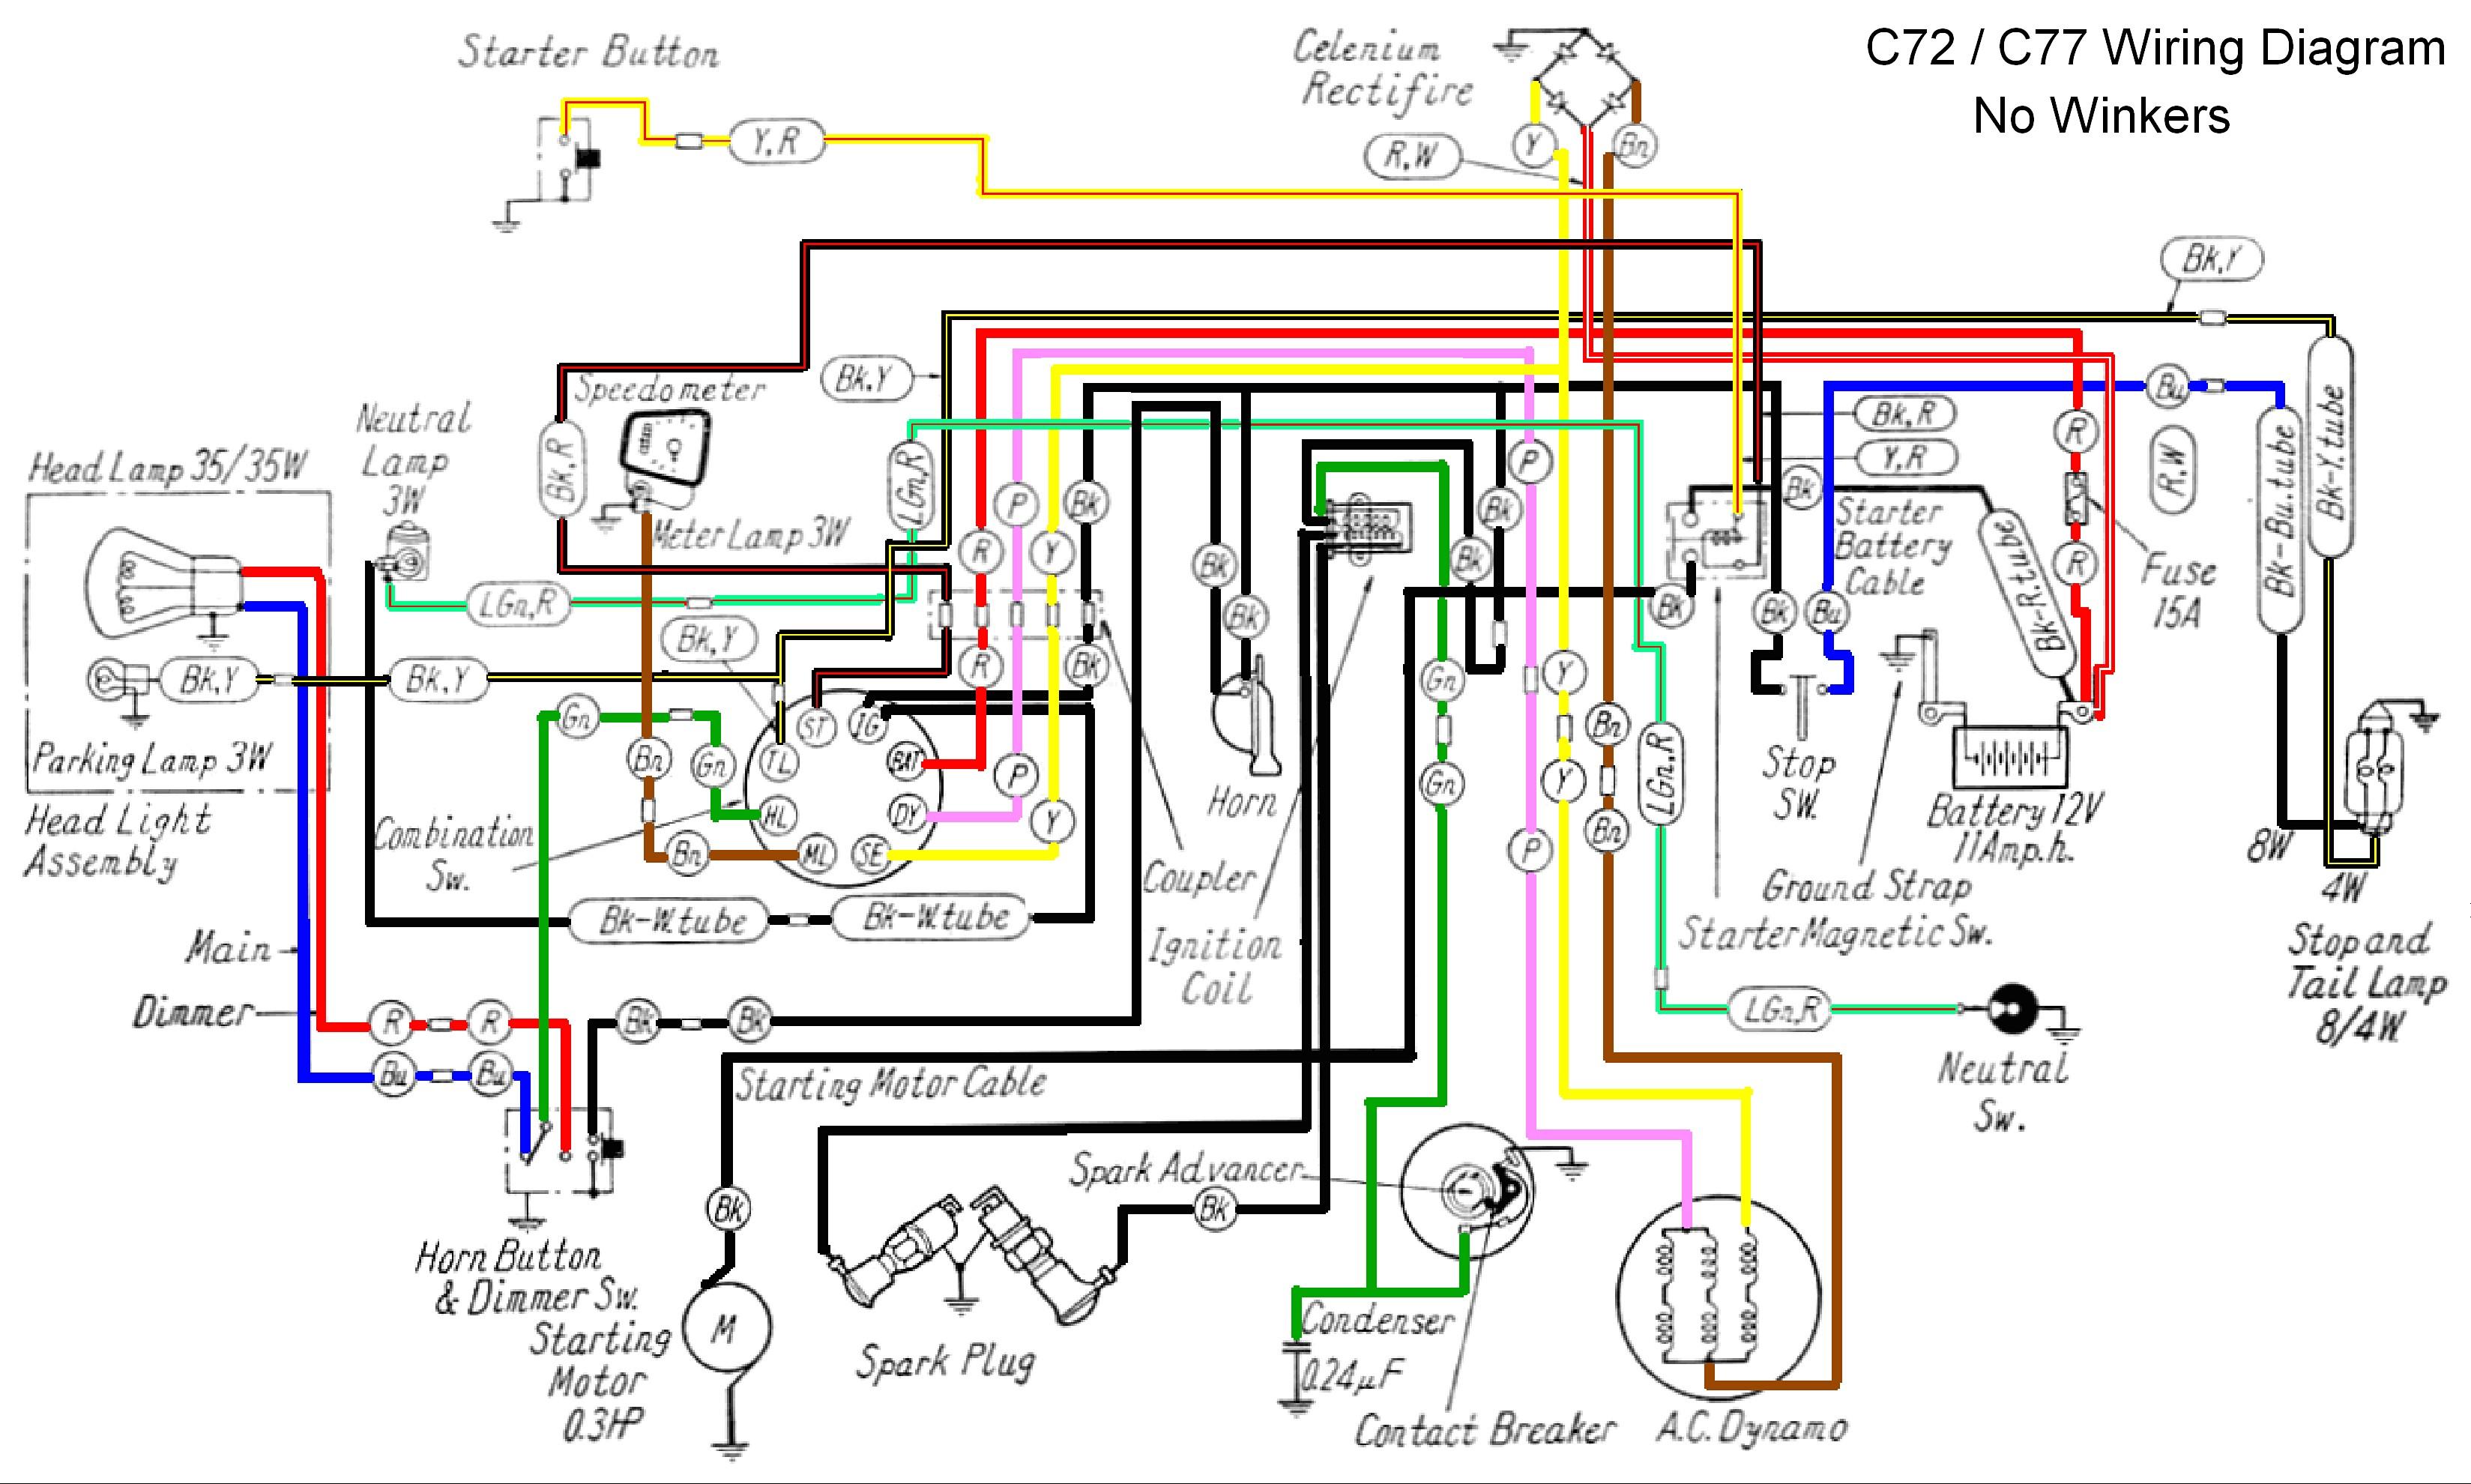 Honda Helix Wiring Diagram Libraries Trx 300ex Cn250 Third Levelhonda Diagrams Schema Trx300ex